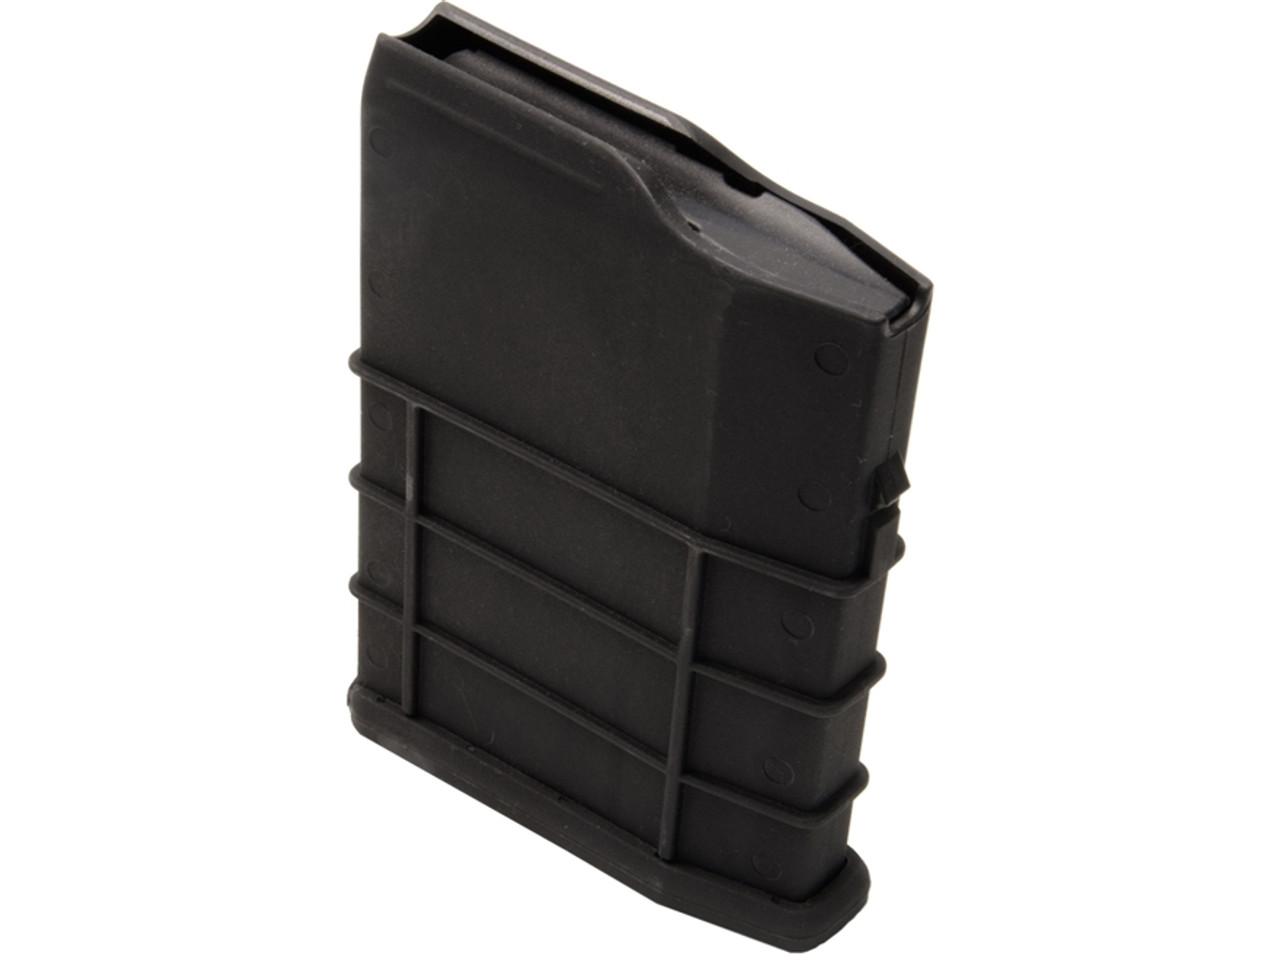 Legacy Sports 10rd Remington 700 .243/7mm-08/.308 magazine